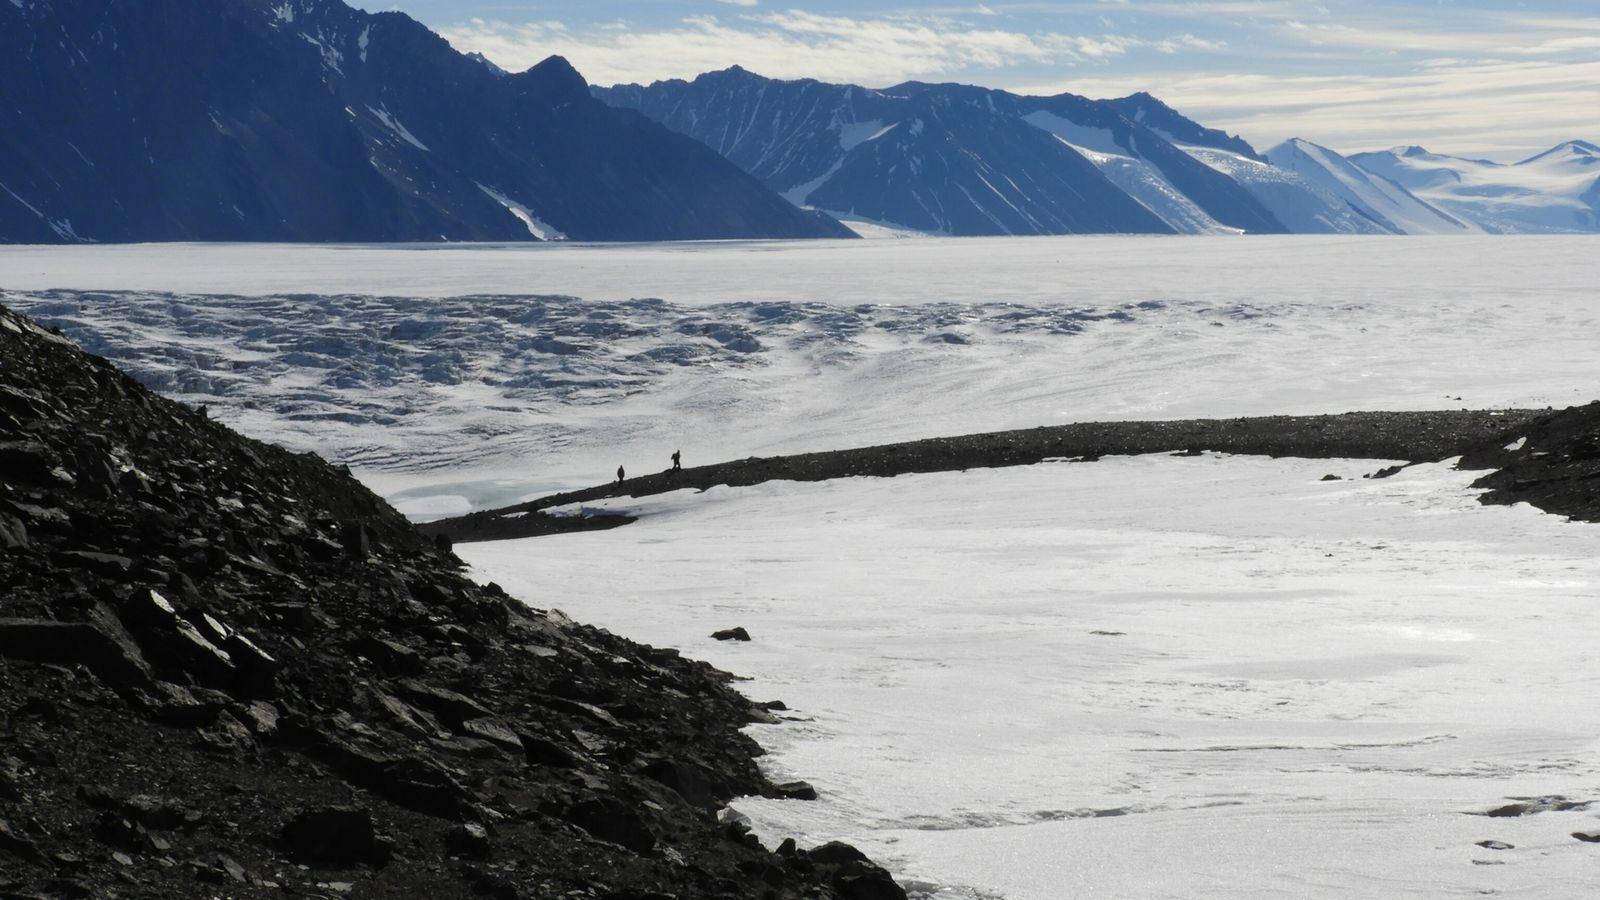 shackleton glacier